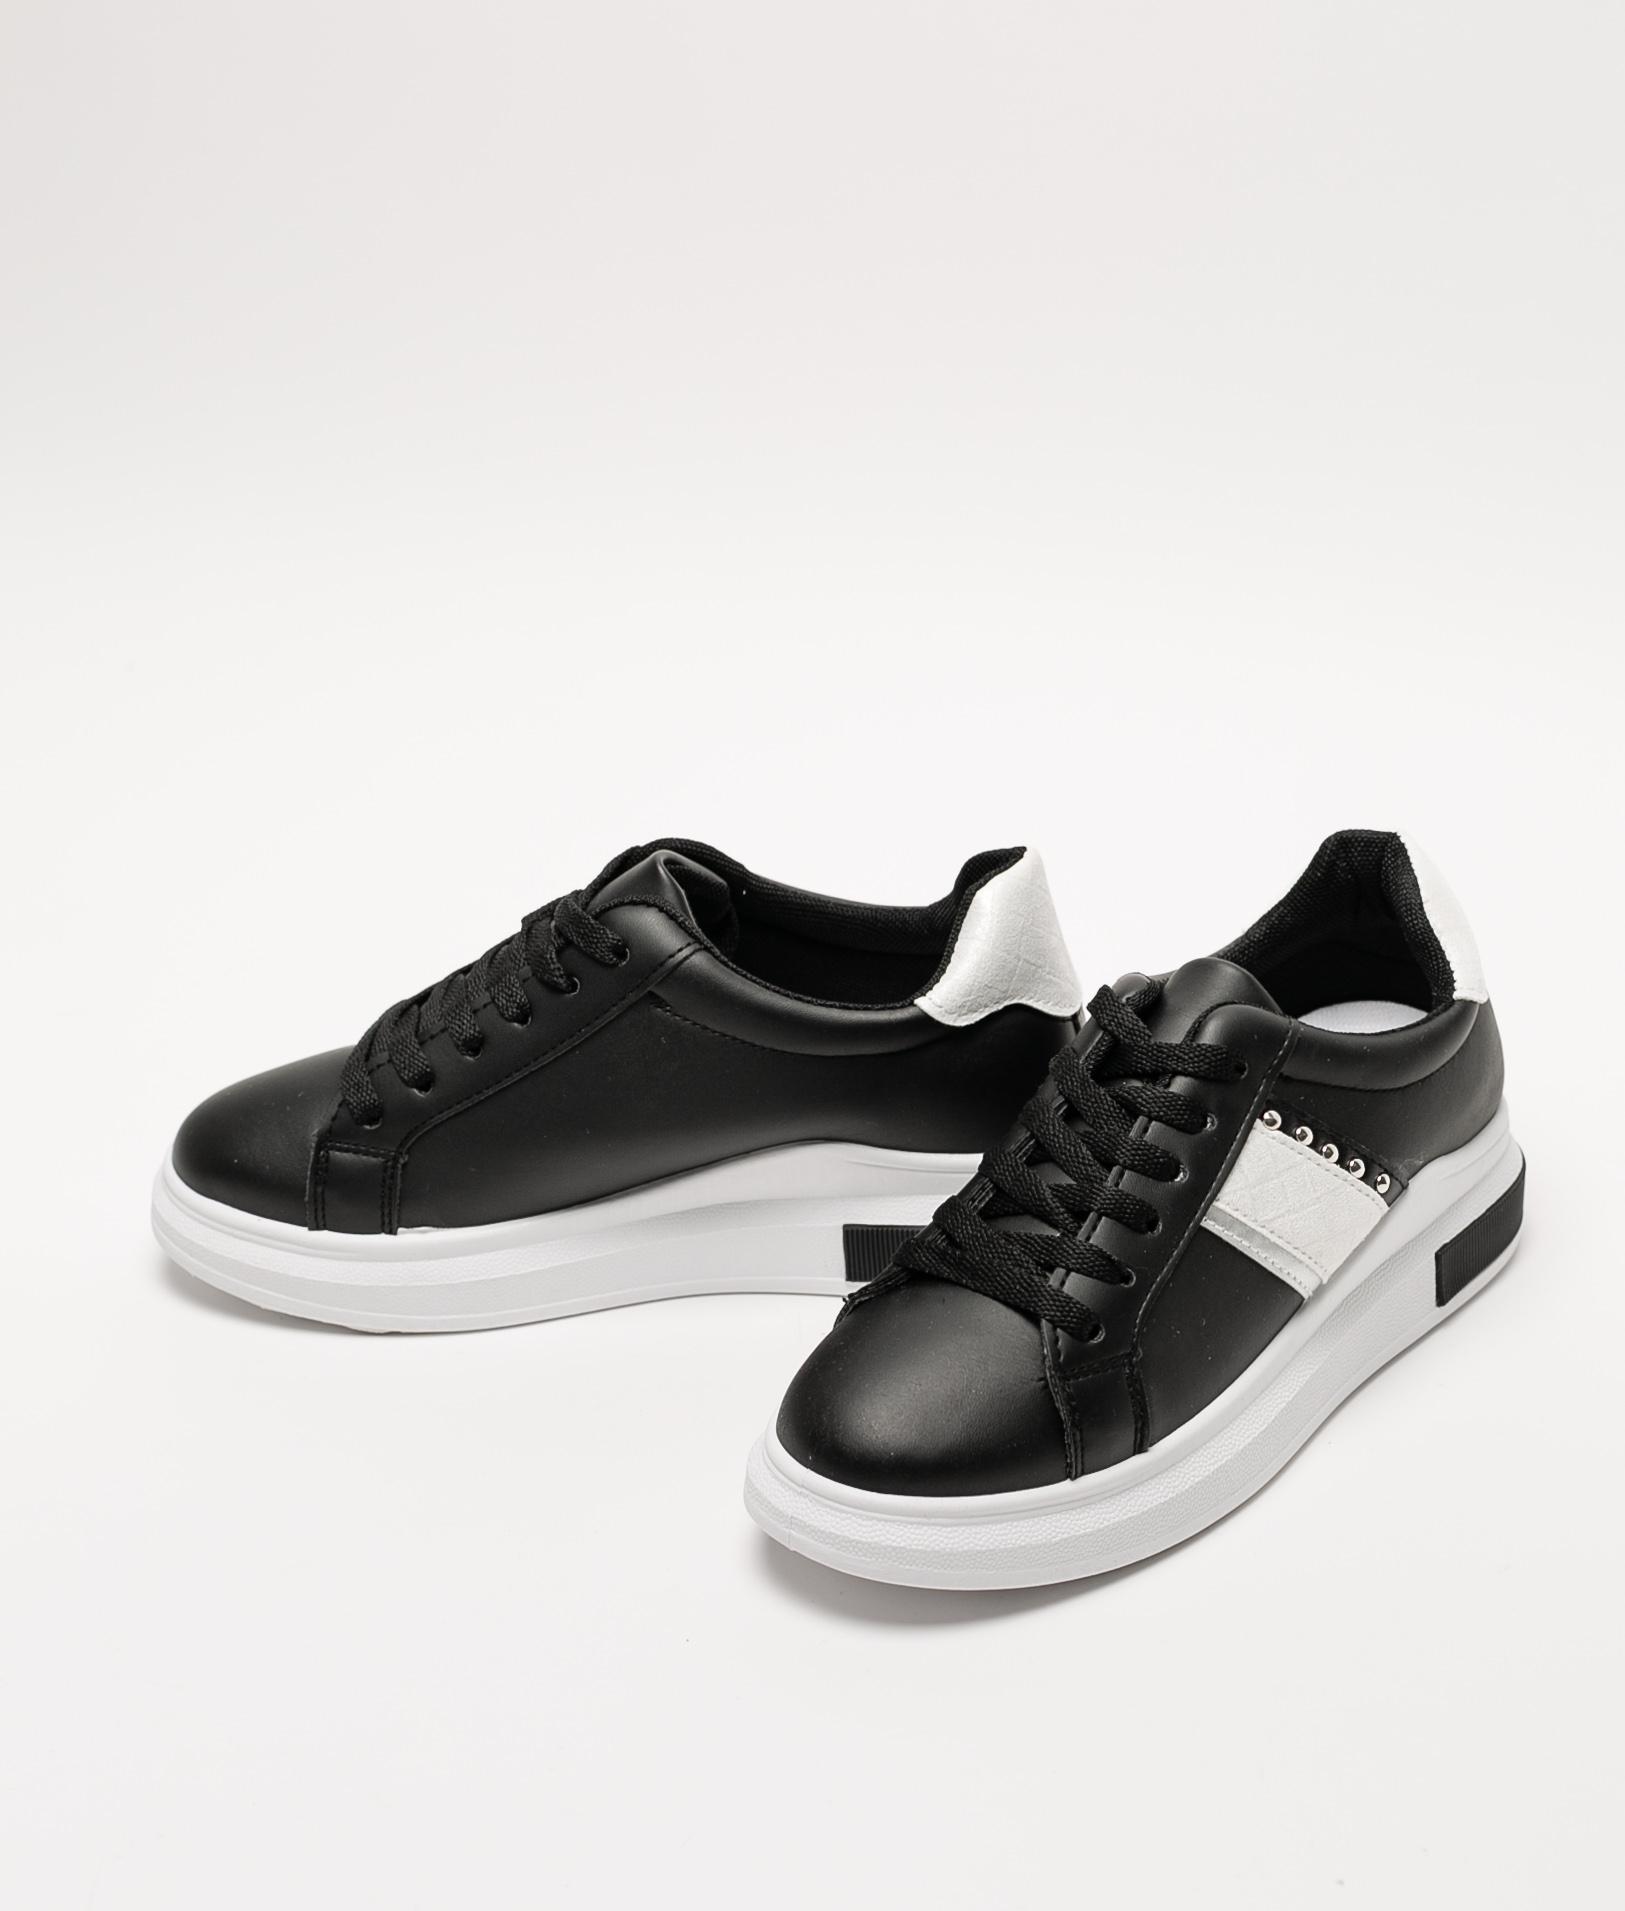 Sneakers PALTA - negro